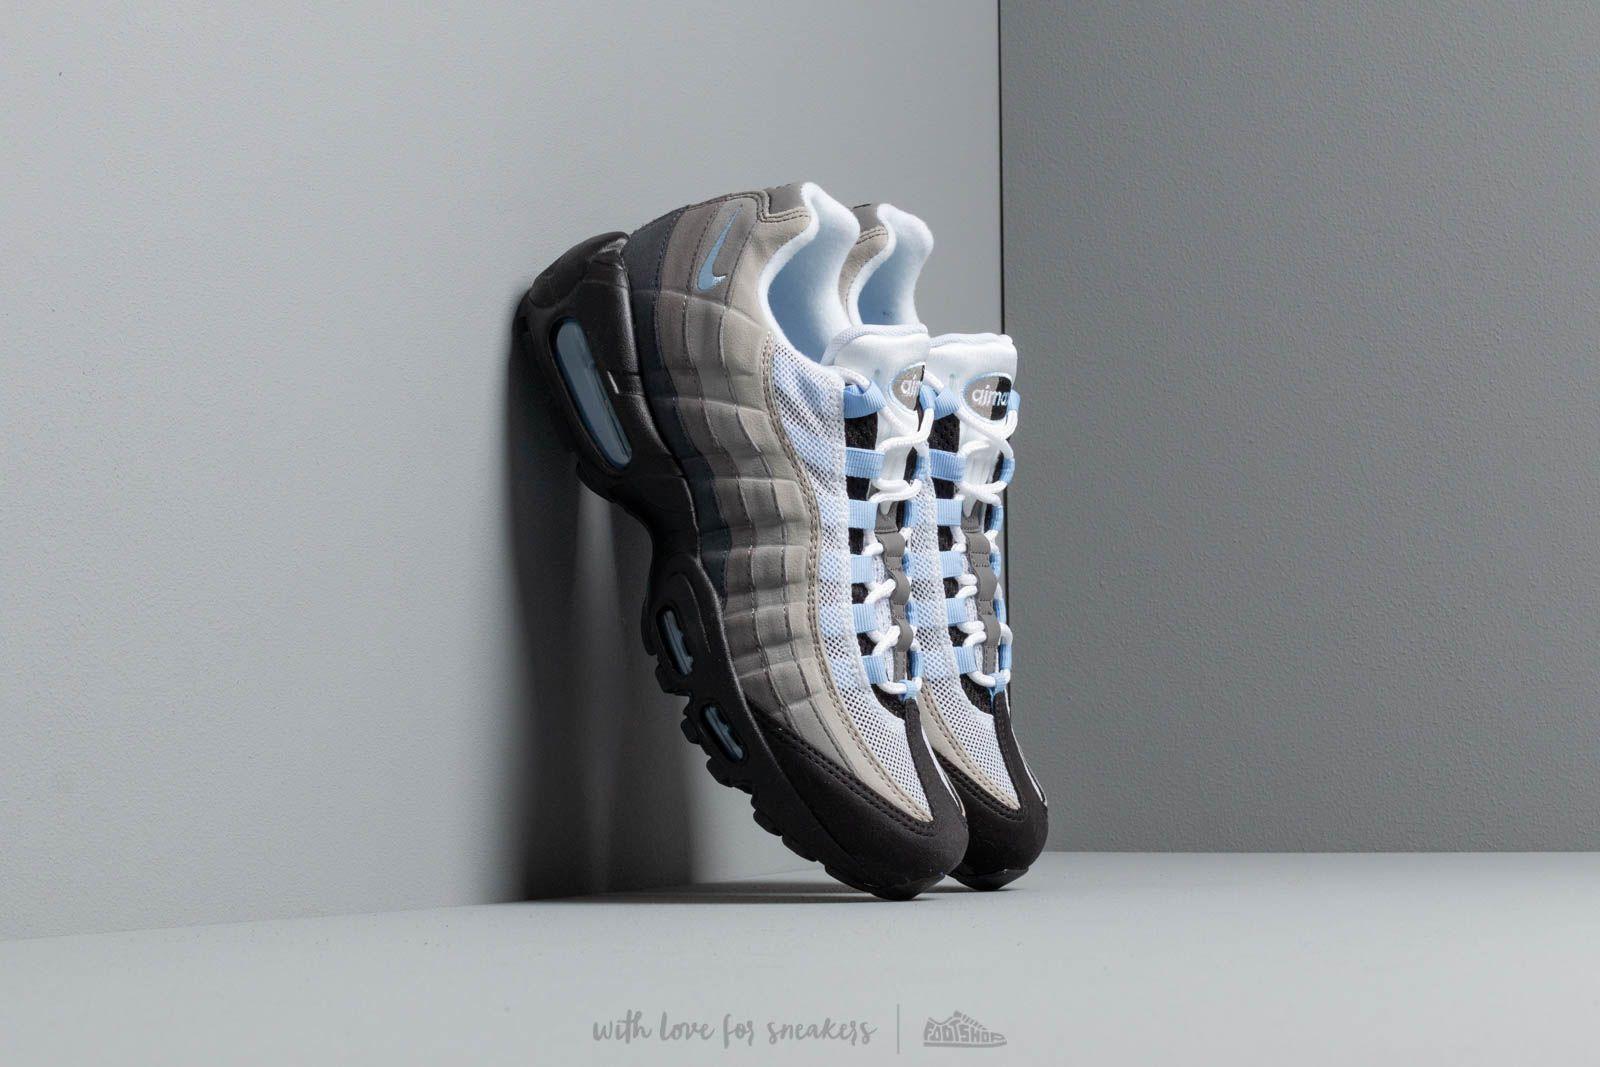 6edc4a7f2f8c5 Nike Air Max 95 Black/ Aluminum-Anthracite la un preț excelent 730 Lei  cumpără